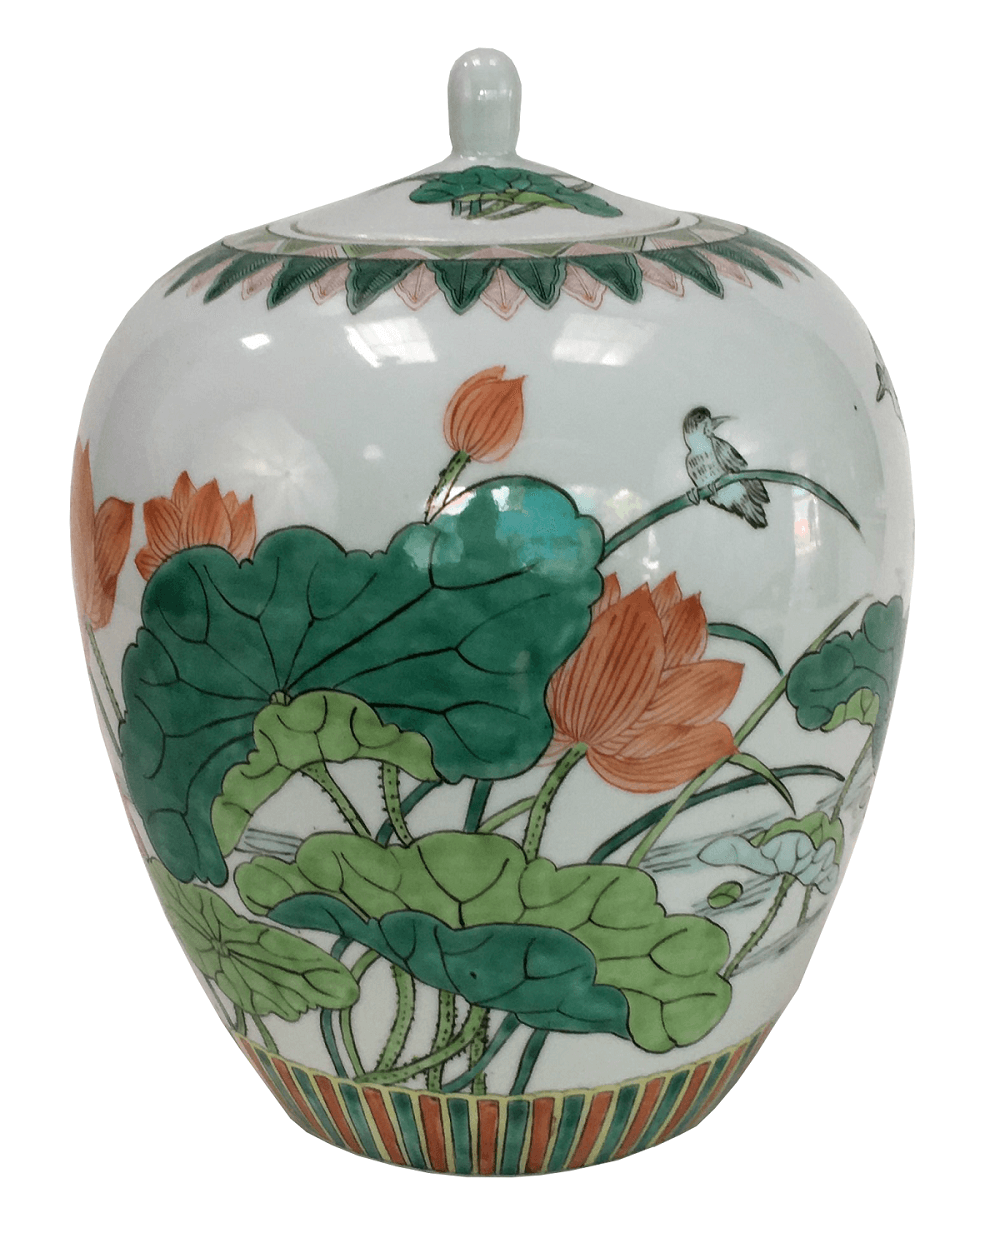 Grande Potiche Porcelana Chinesa Flores Passaros